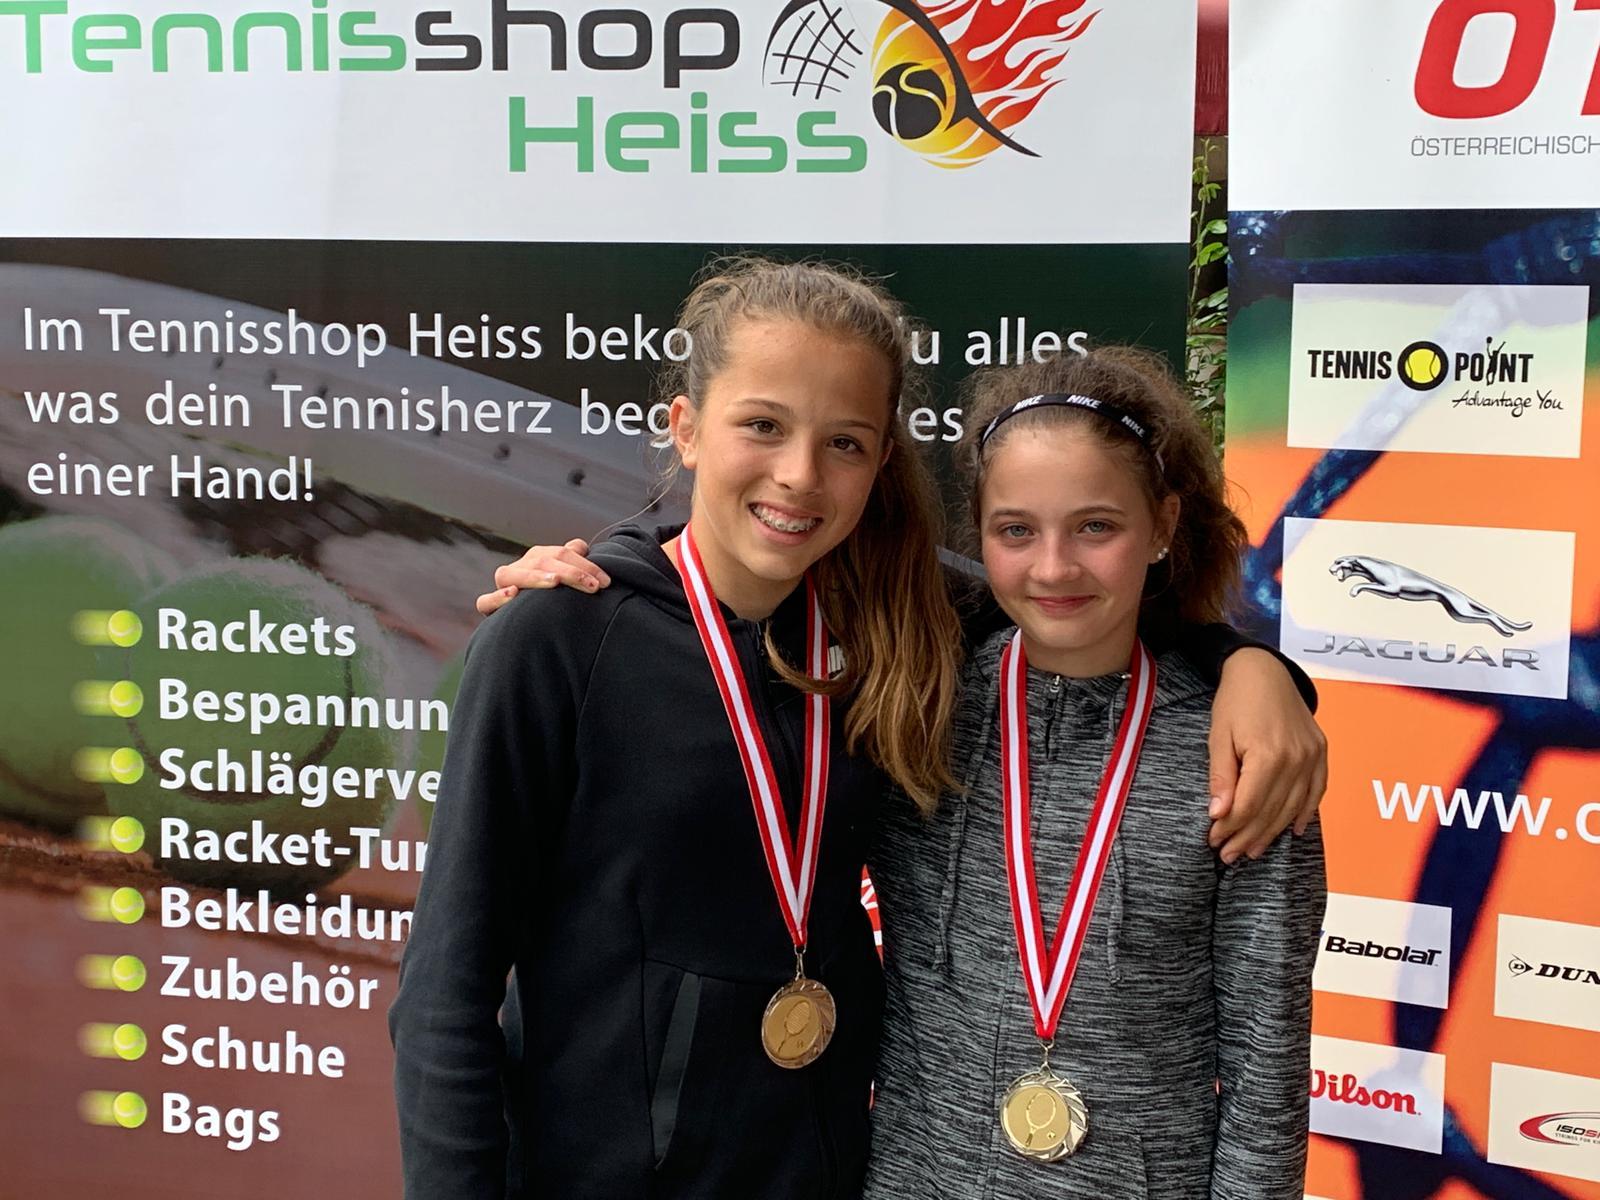 Emma: ÖTV Jugendcircuit 4. Turnier Warmbad Villach 25.05 – 28.05.2019 Warmbad Villach